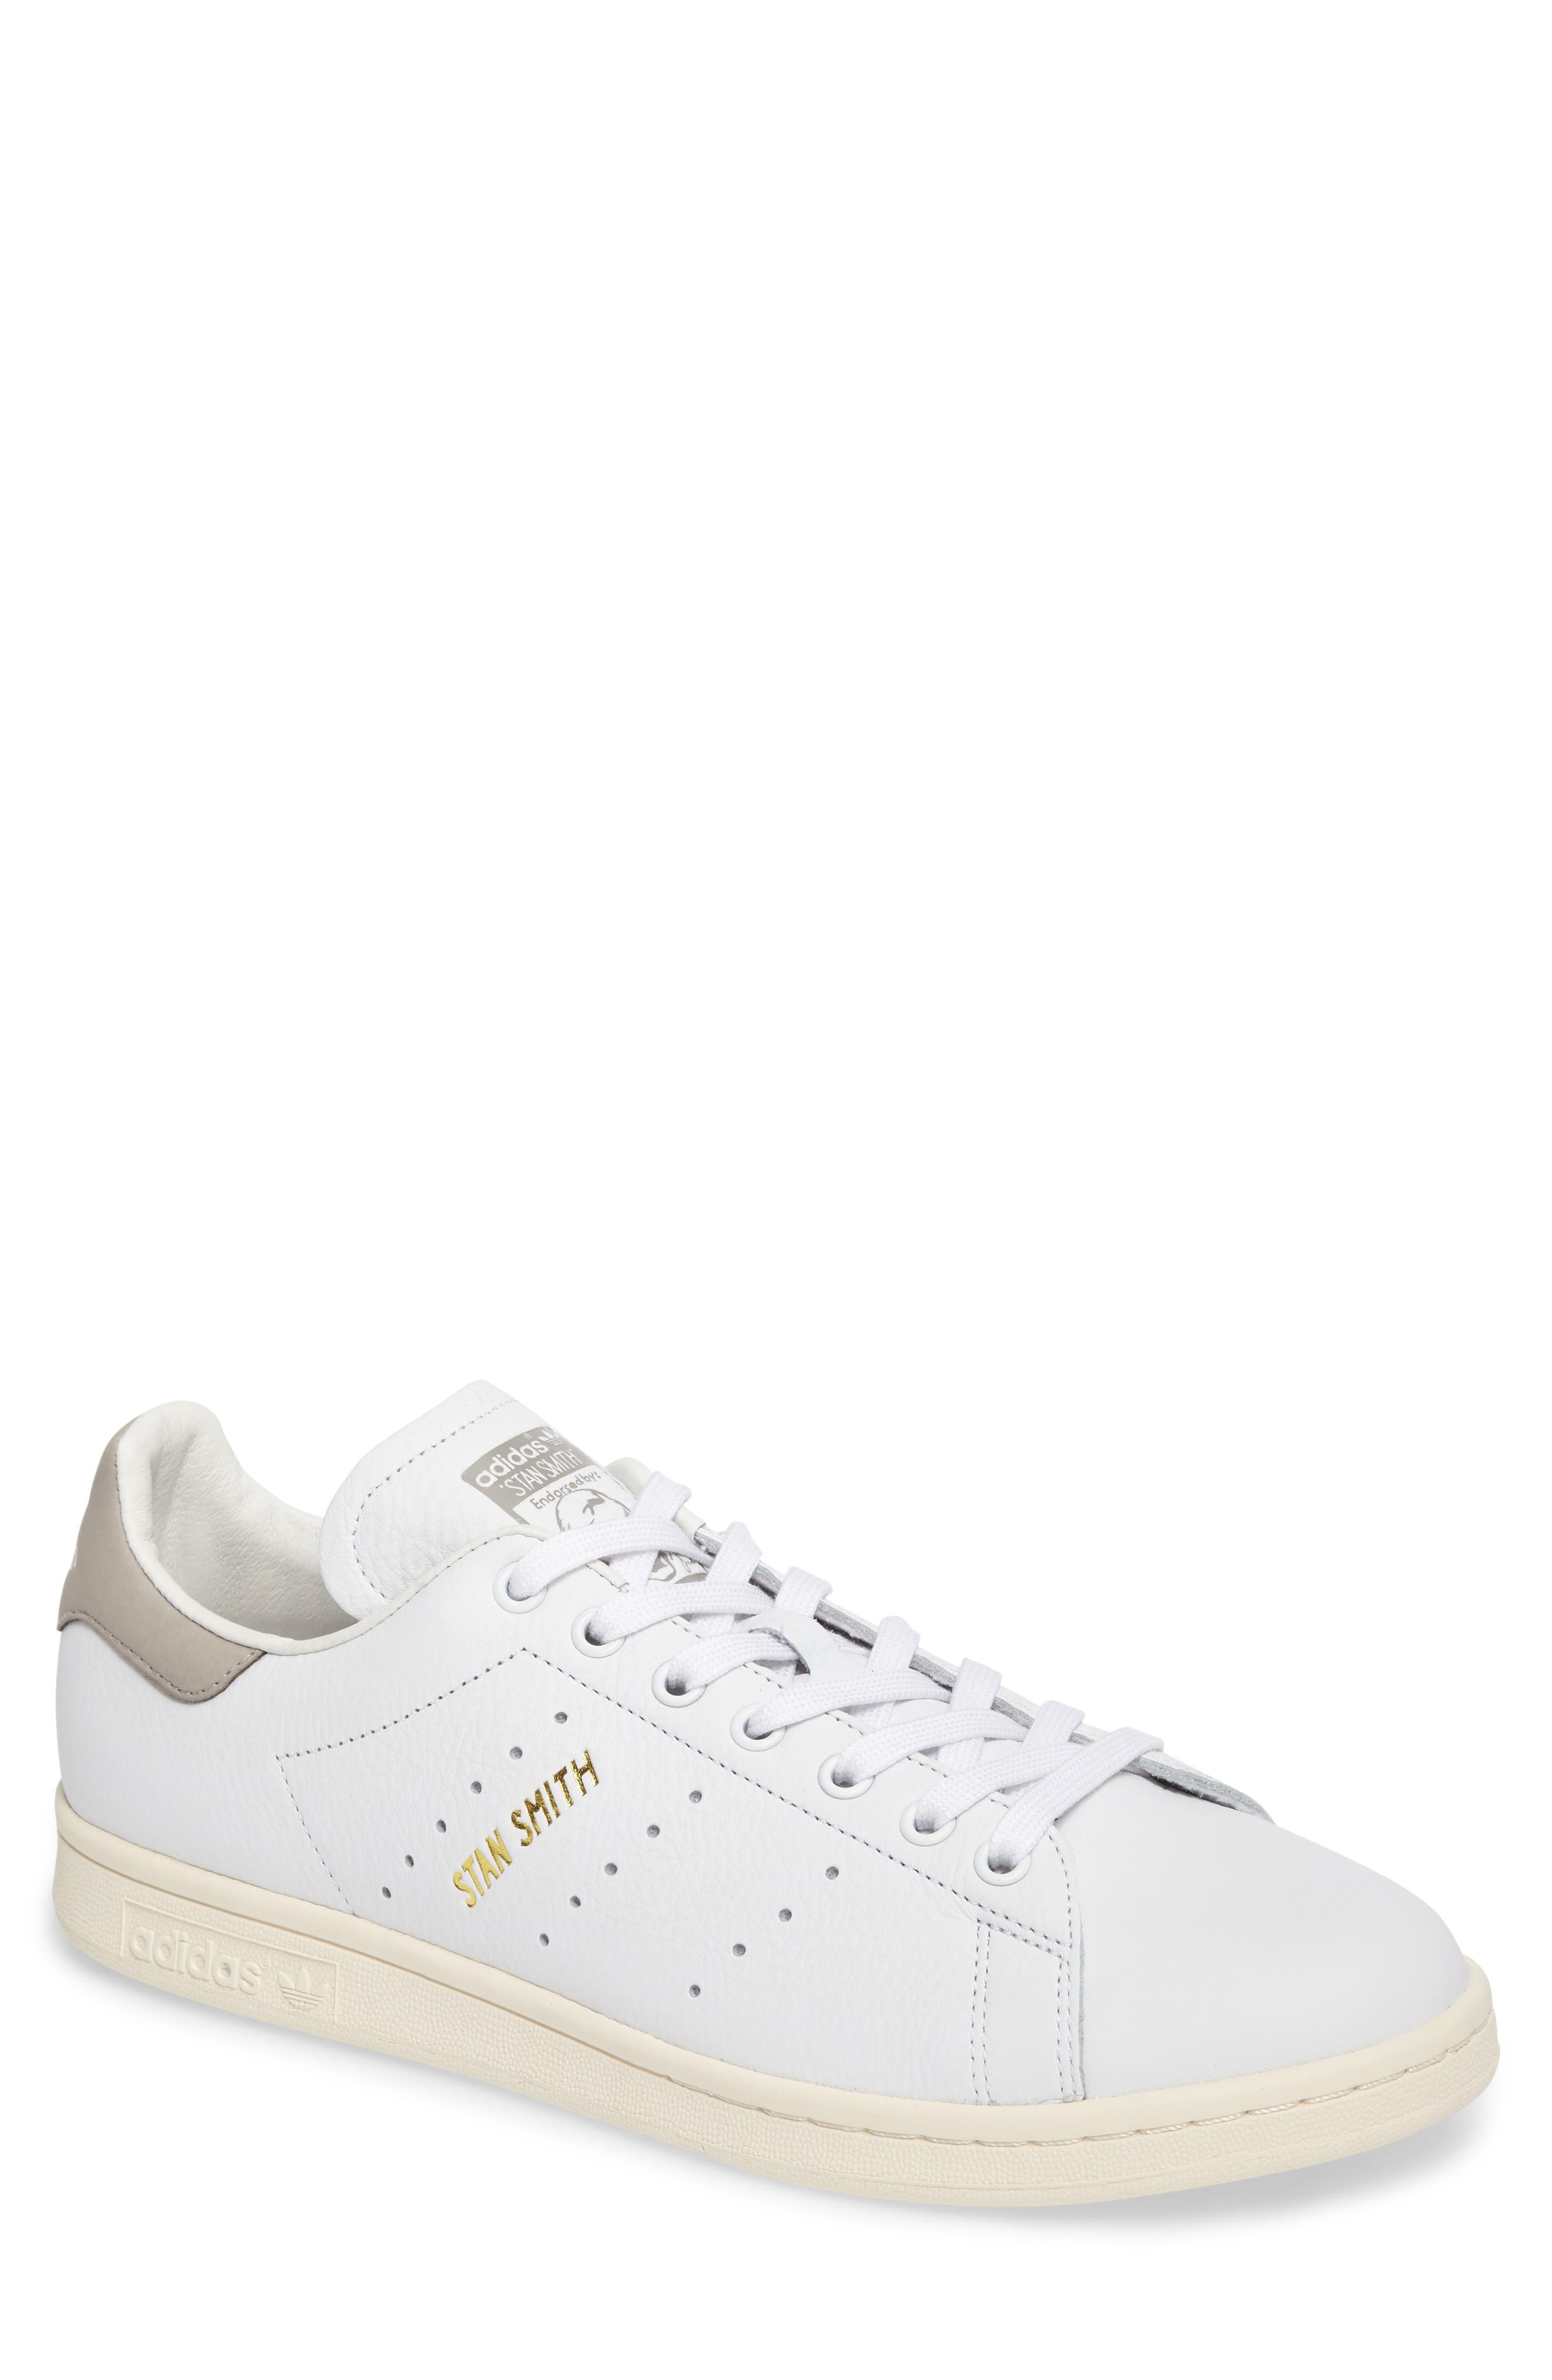 Stan Smith Sneaker,                             Main thumbnail 1, color,                             100